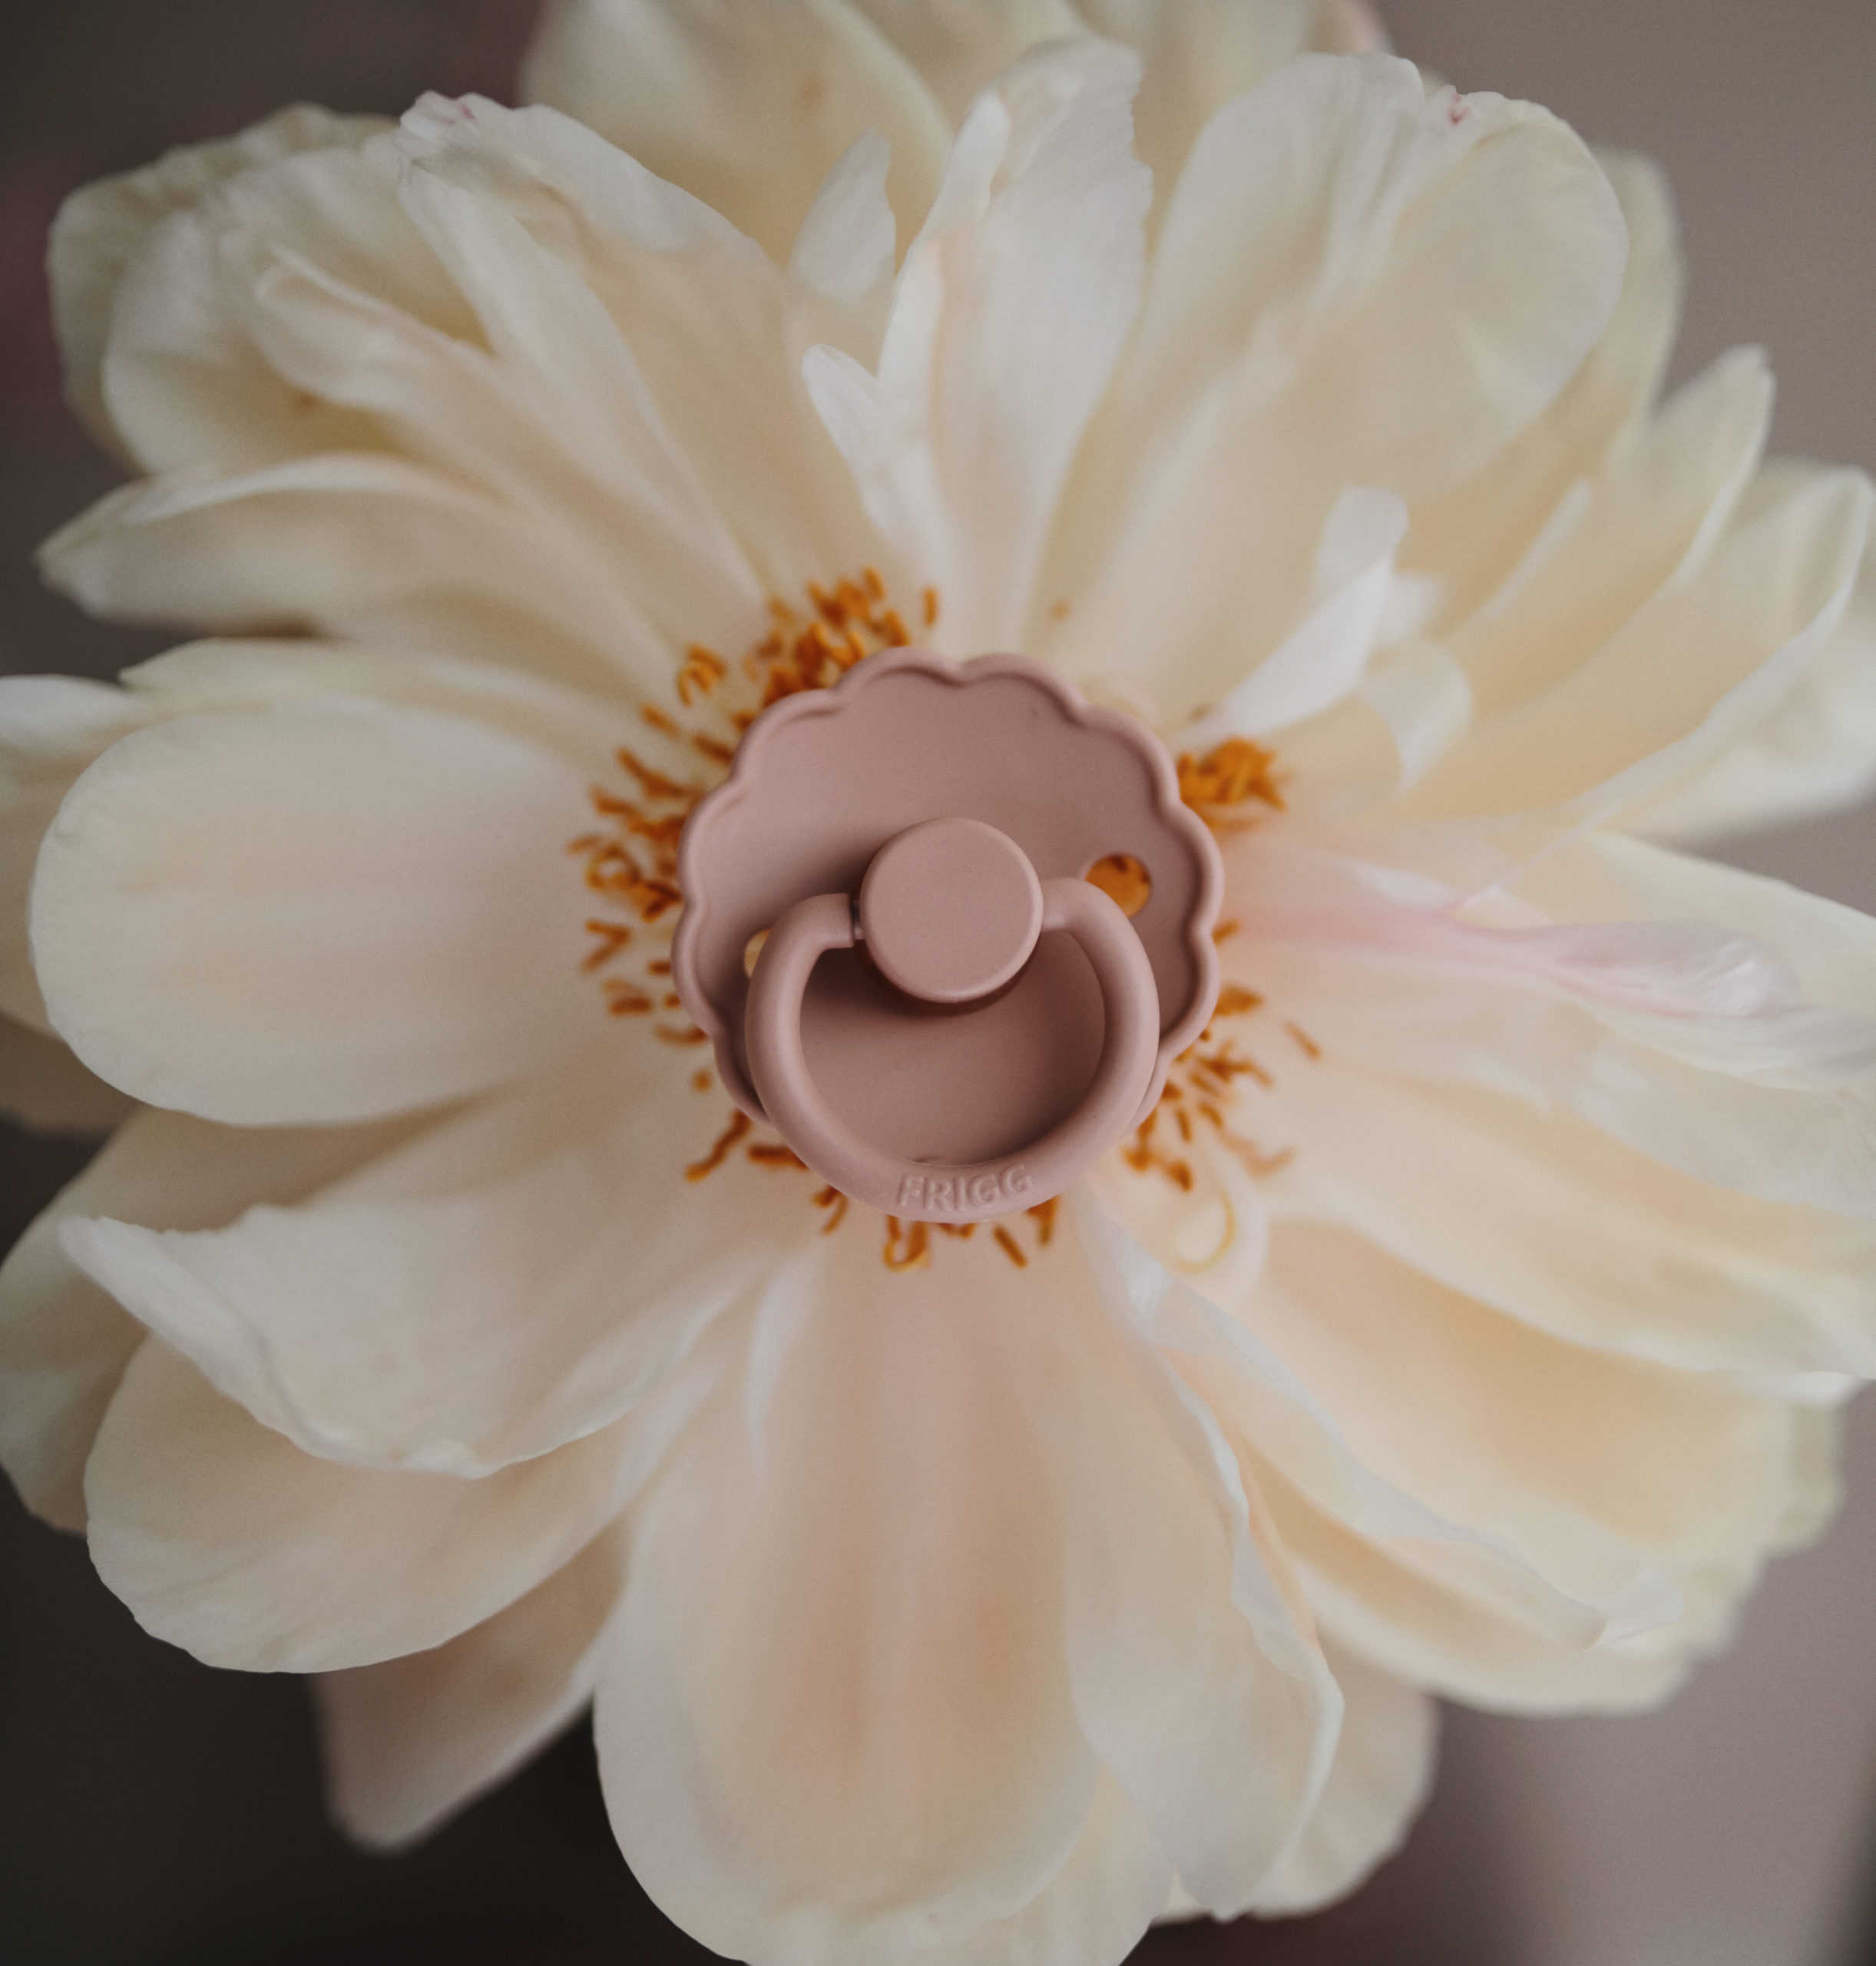 FRIGG daisy speen